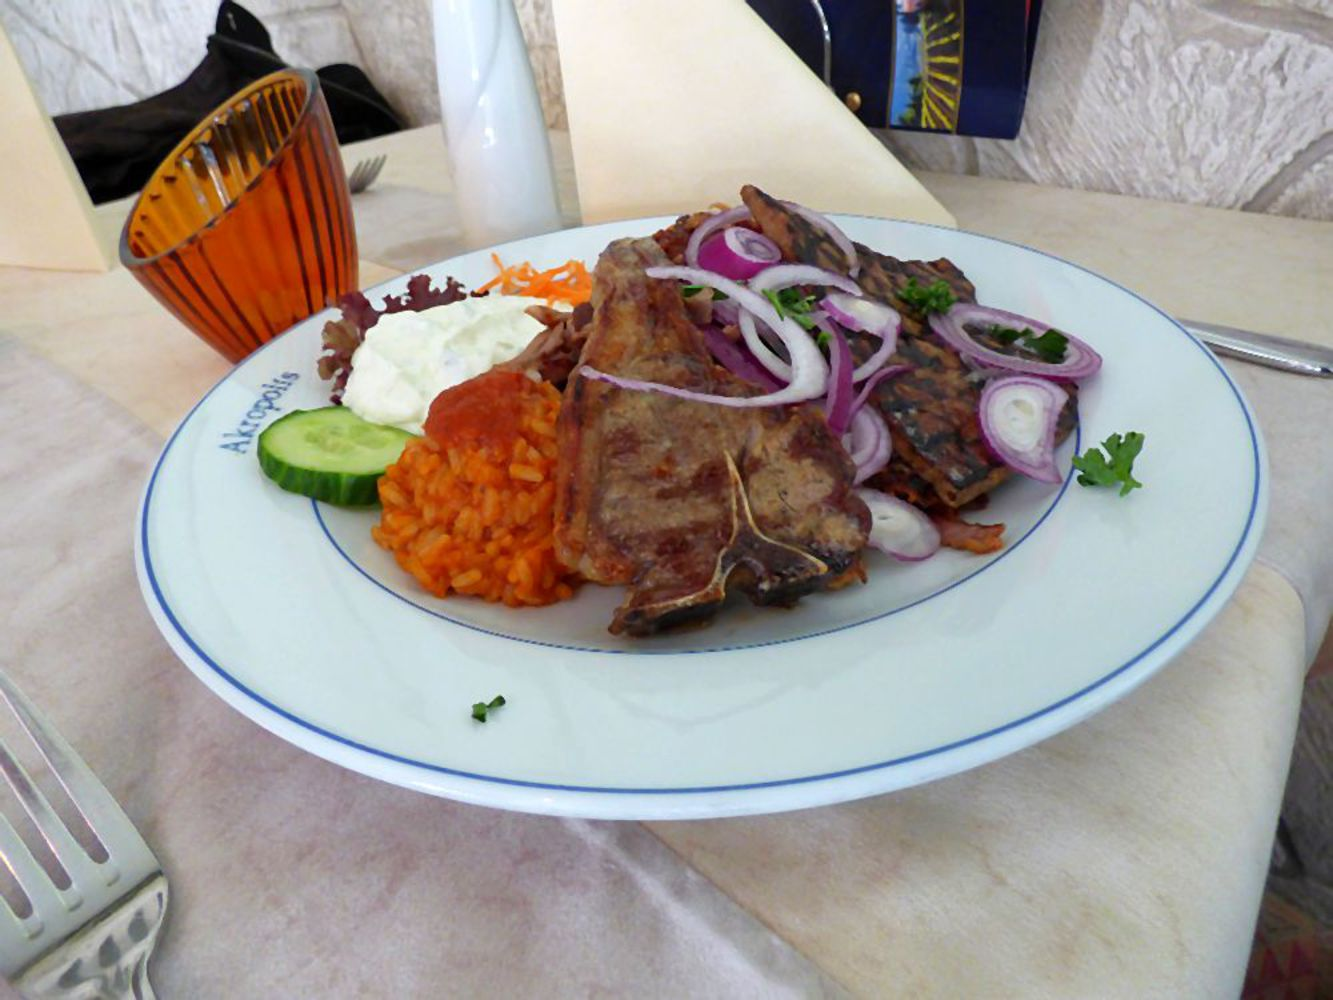 Griechisches restaurant greek food akropolis niendorf for Akropolis greek cuisine merrillville in